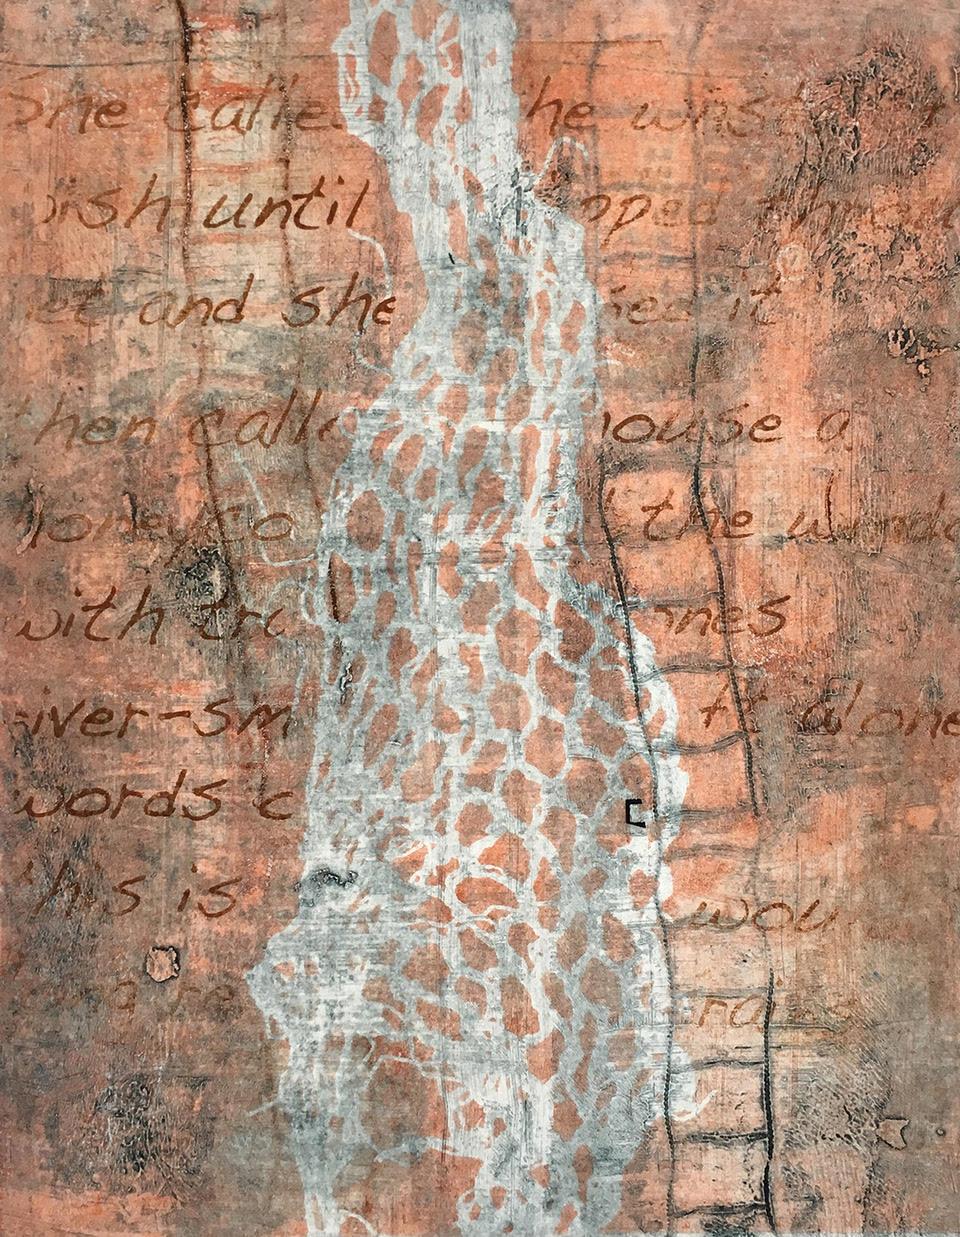 """Forgotten"", monoprint, 16"" x 22"", $300"